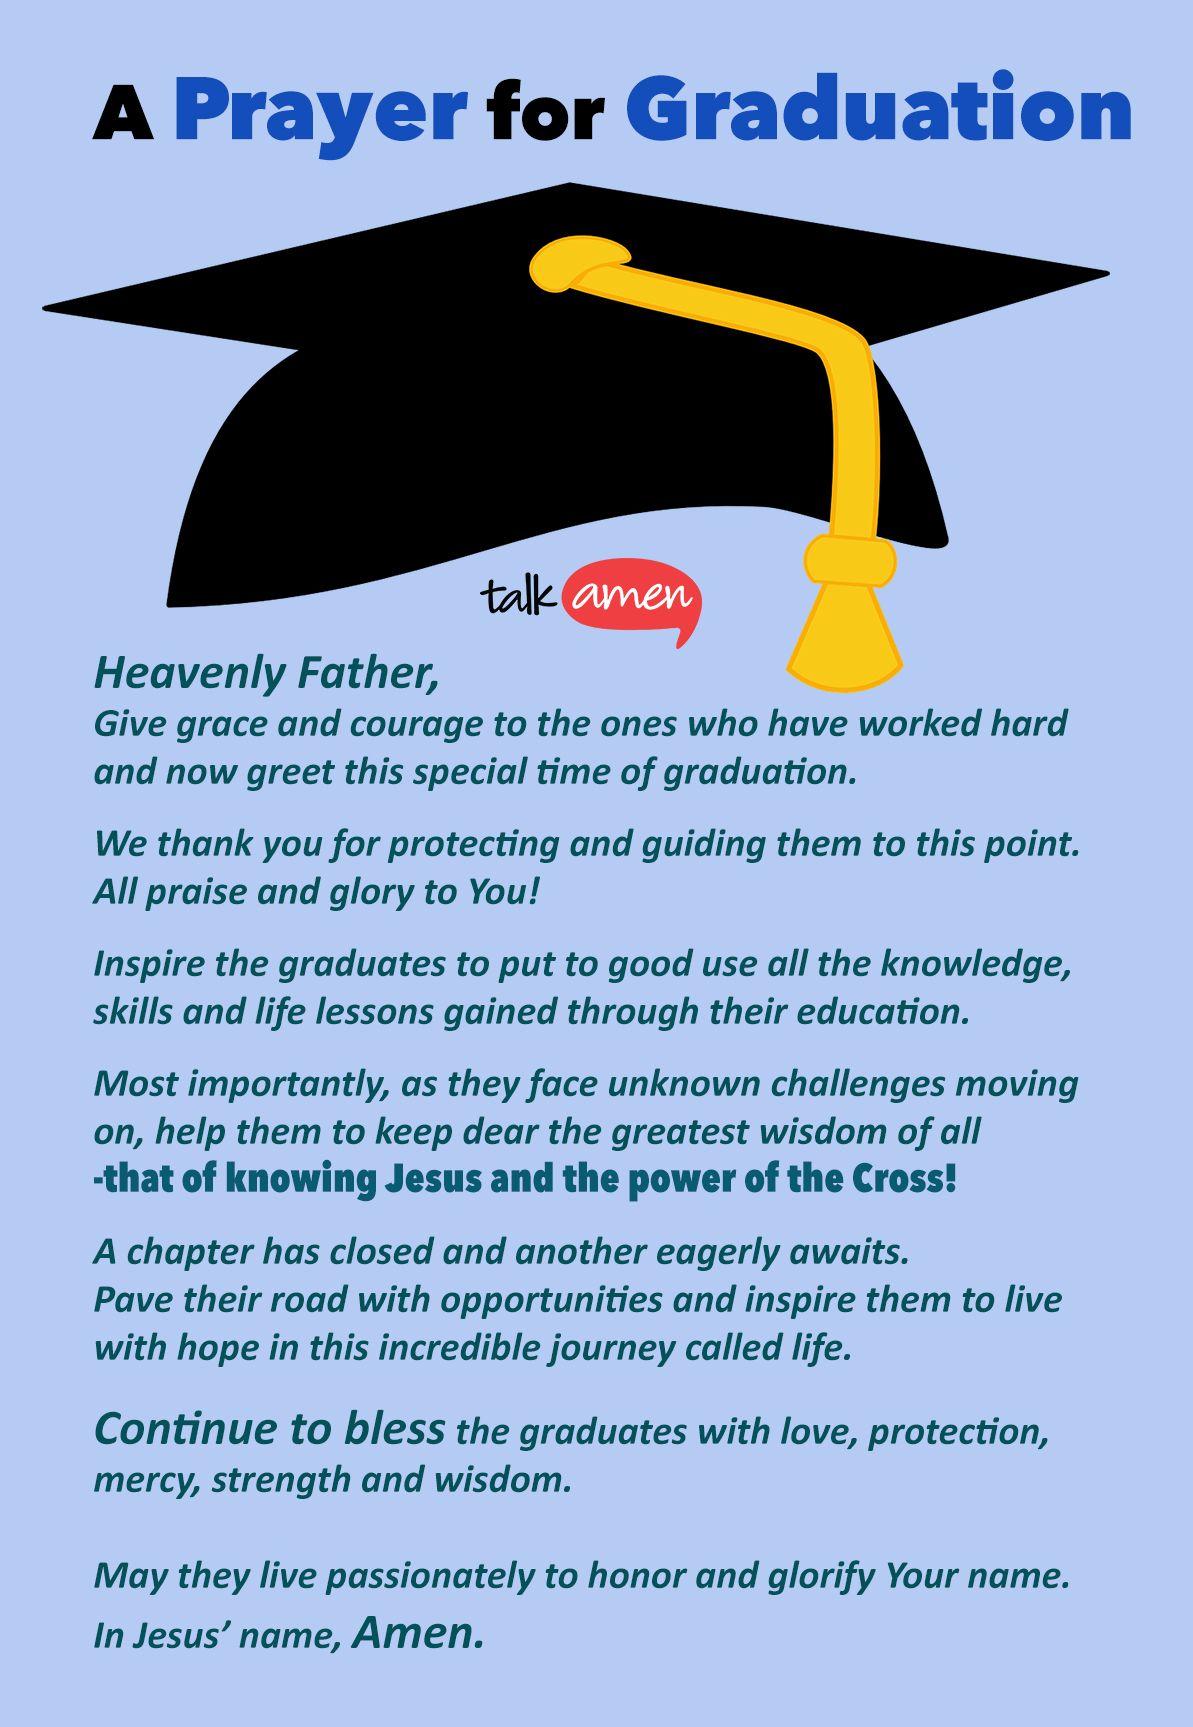 graduation prayer | silverware | Pinterest | Graduation ...